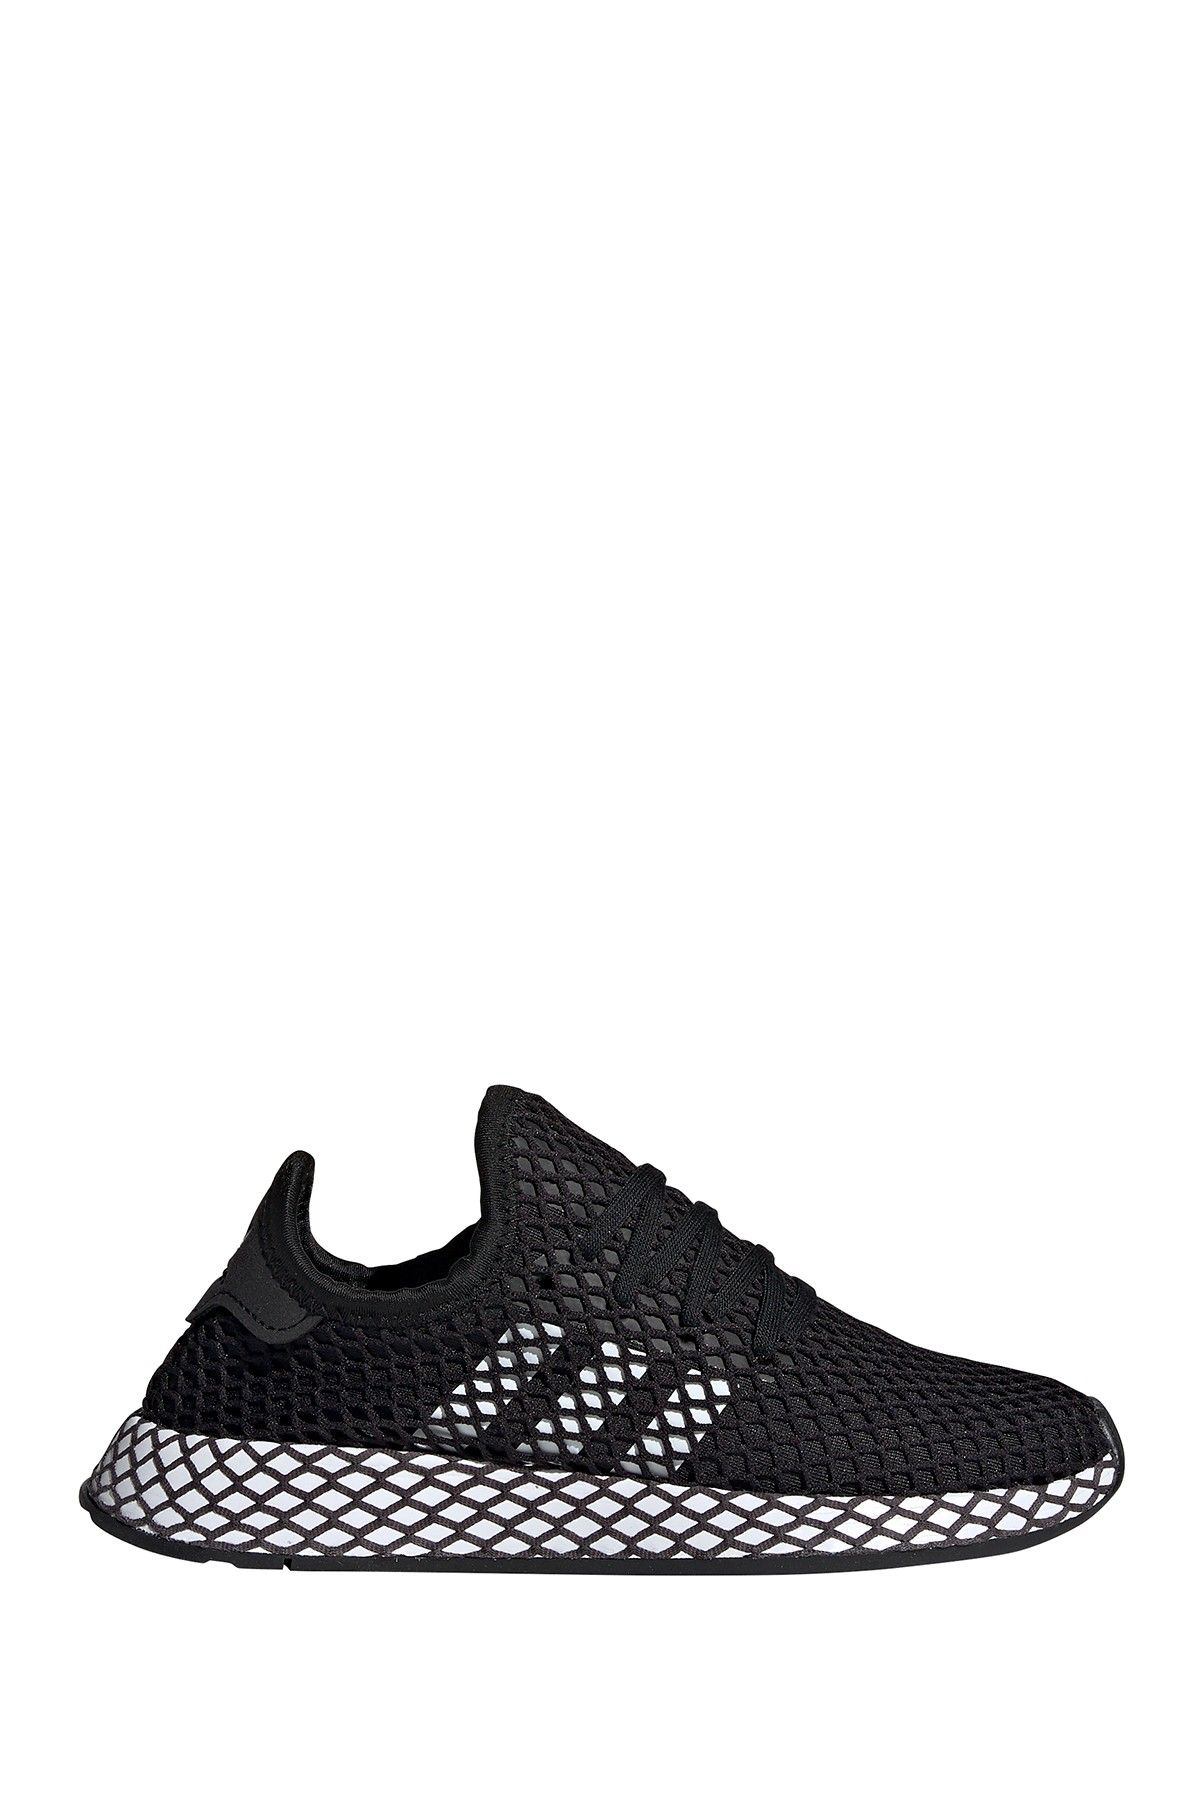 adidas Deerupt Sneaker (Big Kid